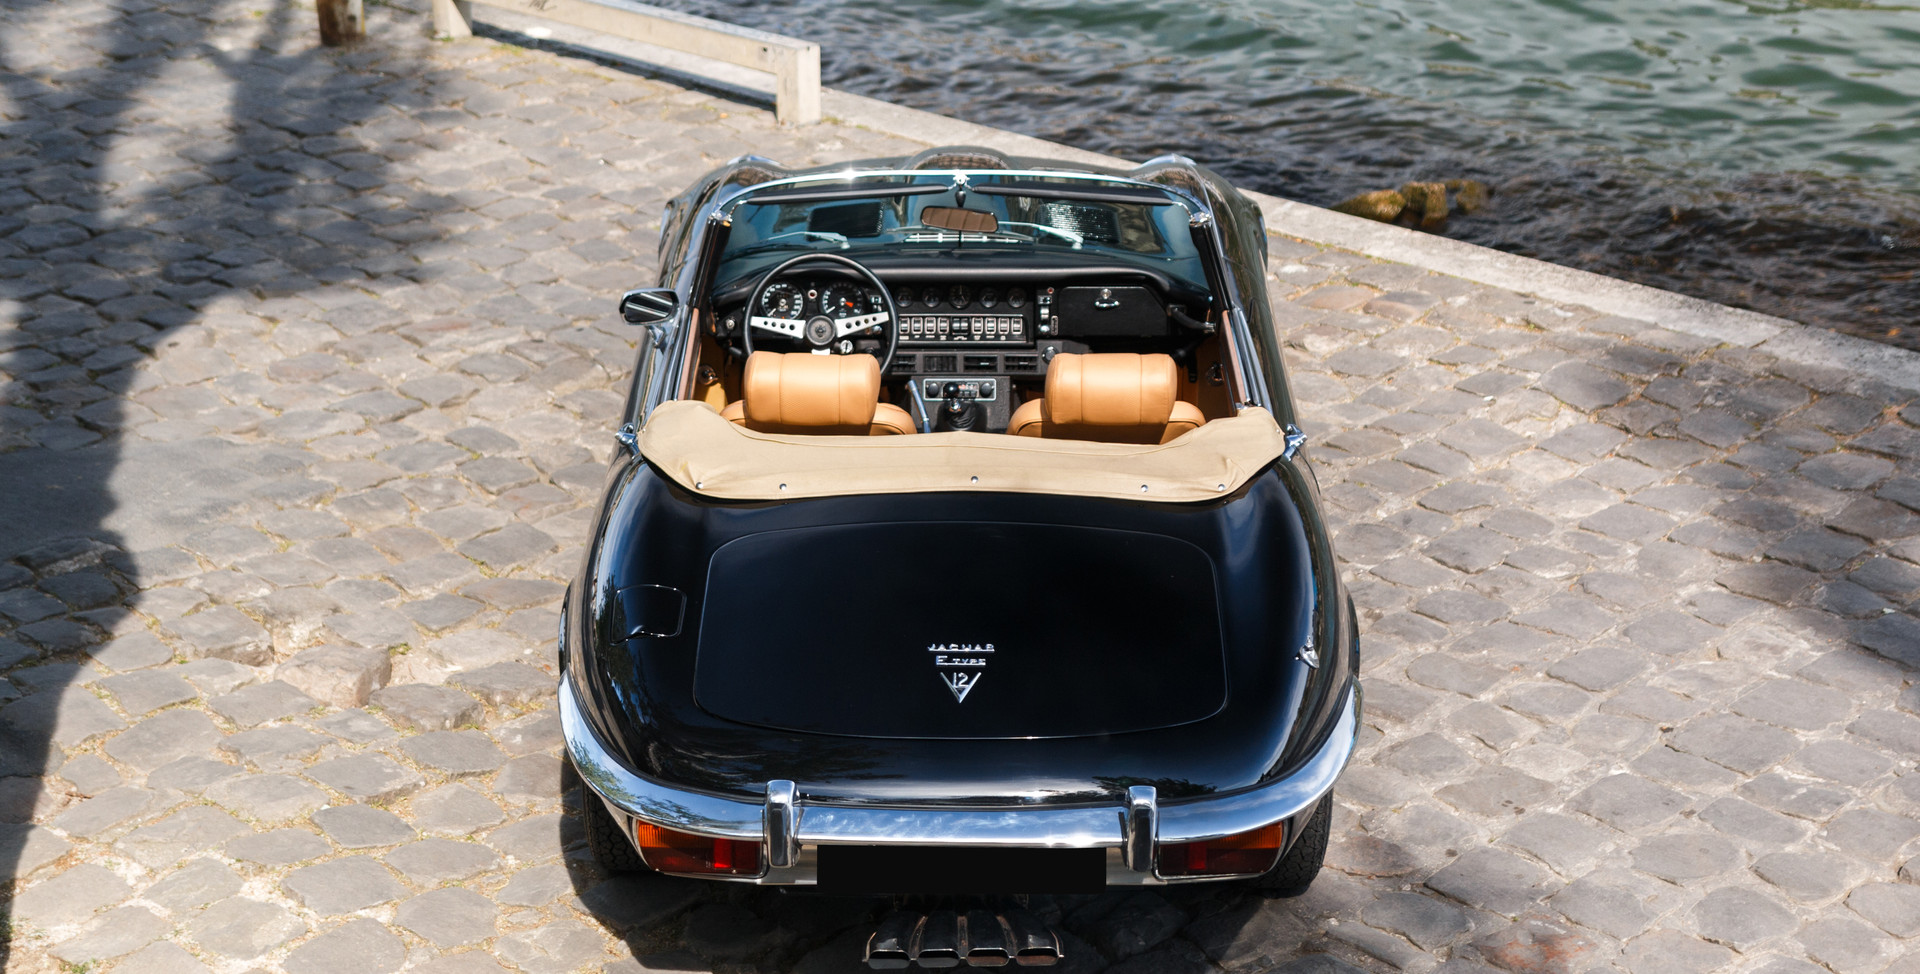 Jaguar_Type_E_arrière_(4).jpg